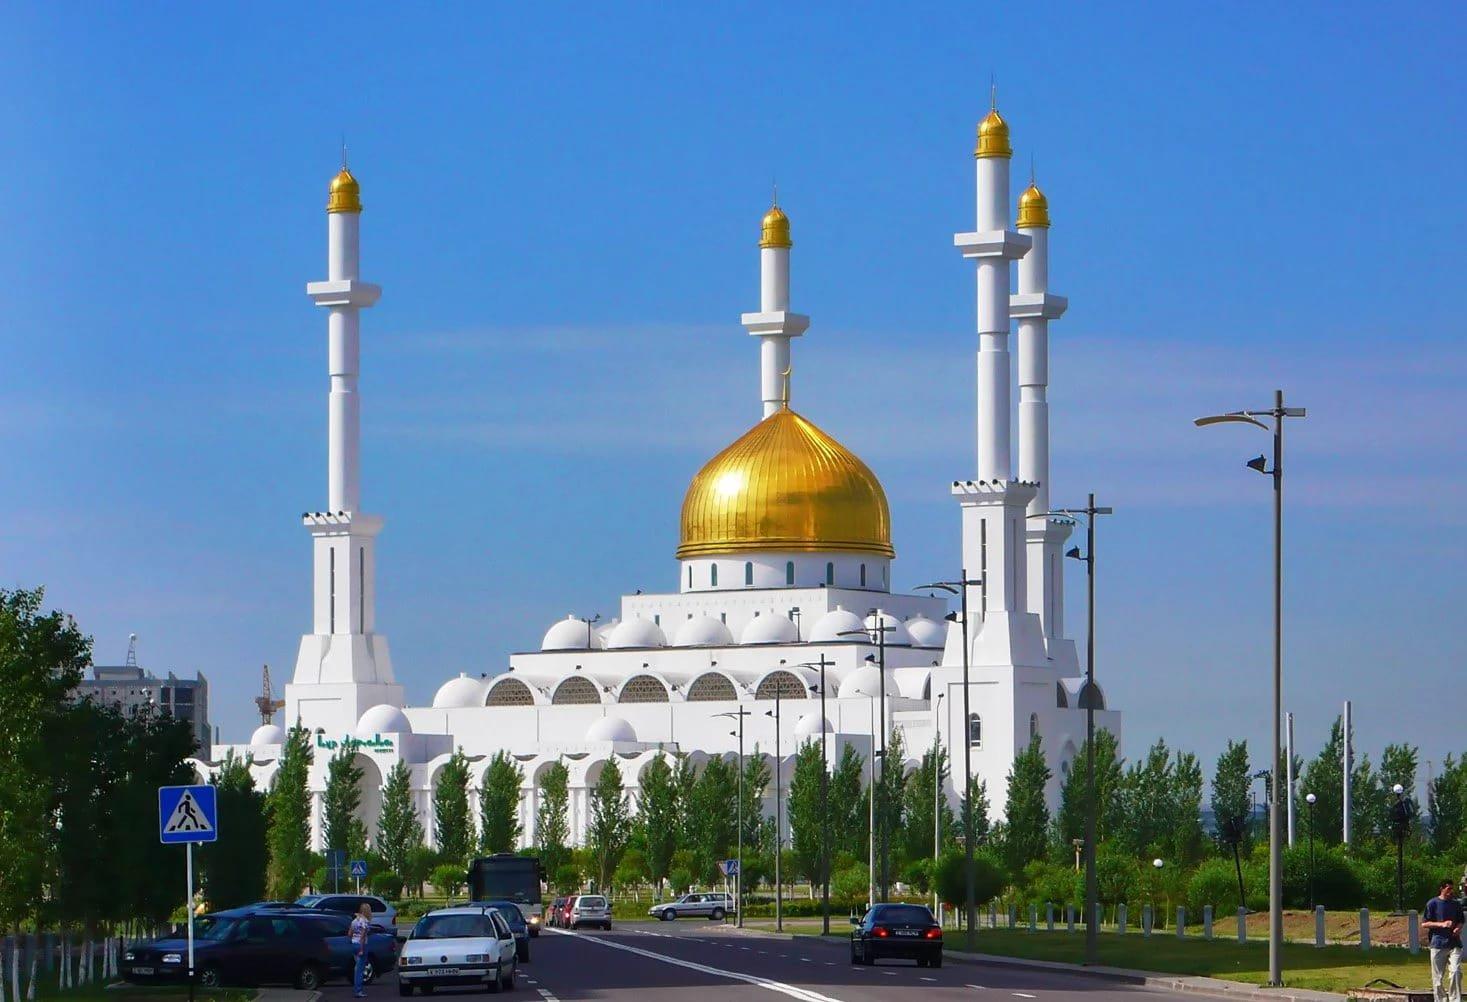 Президент в праздник Ораза айт пожелал казахстанцам мира, единства и спокойствия